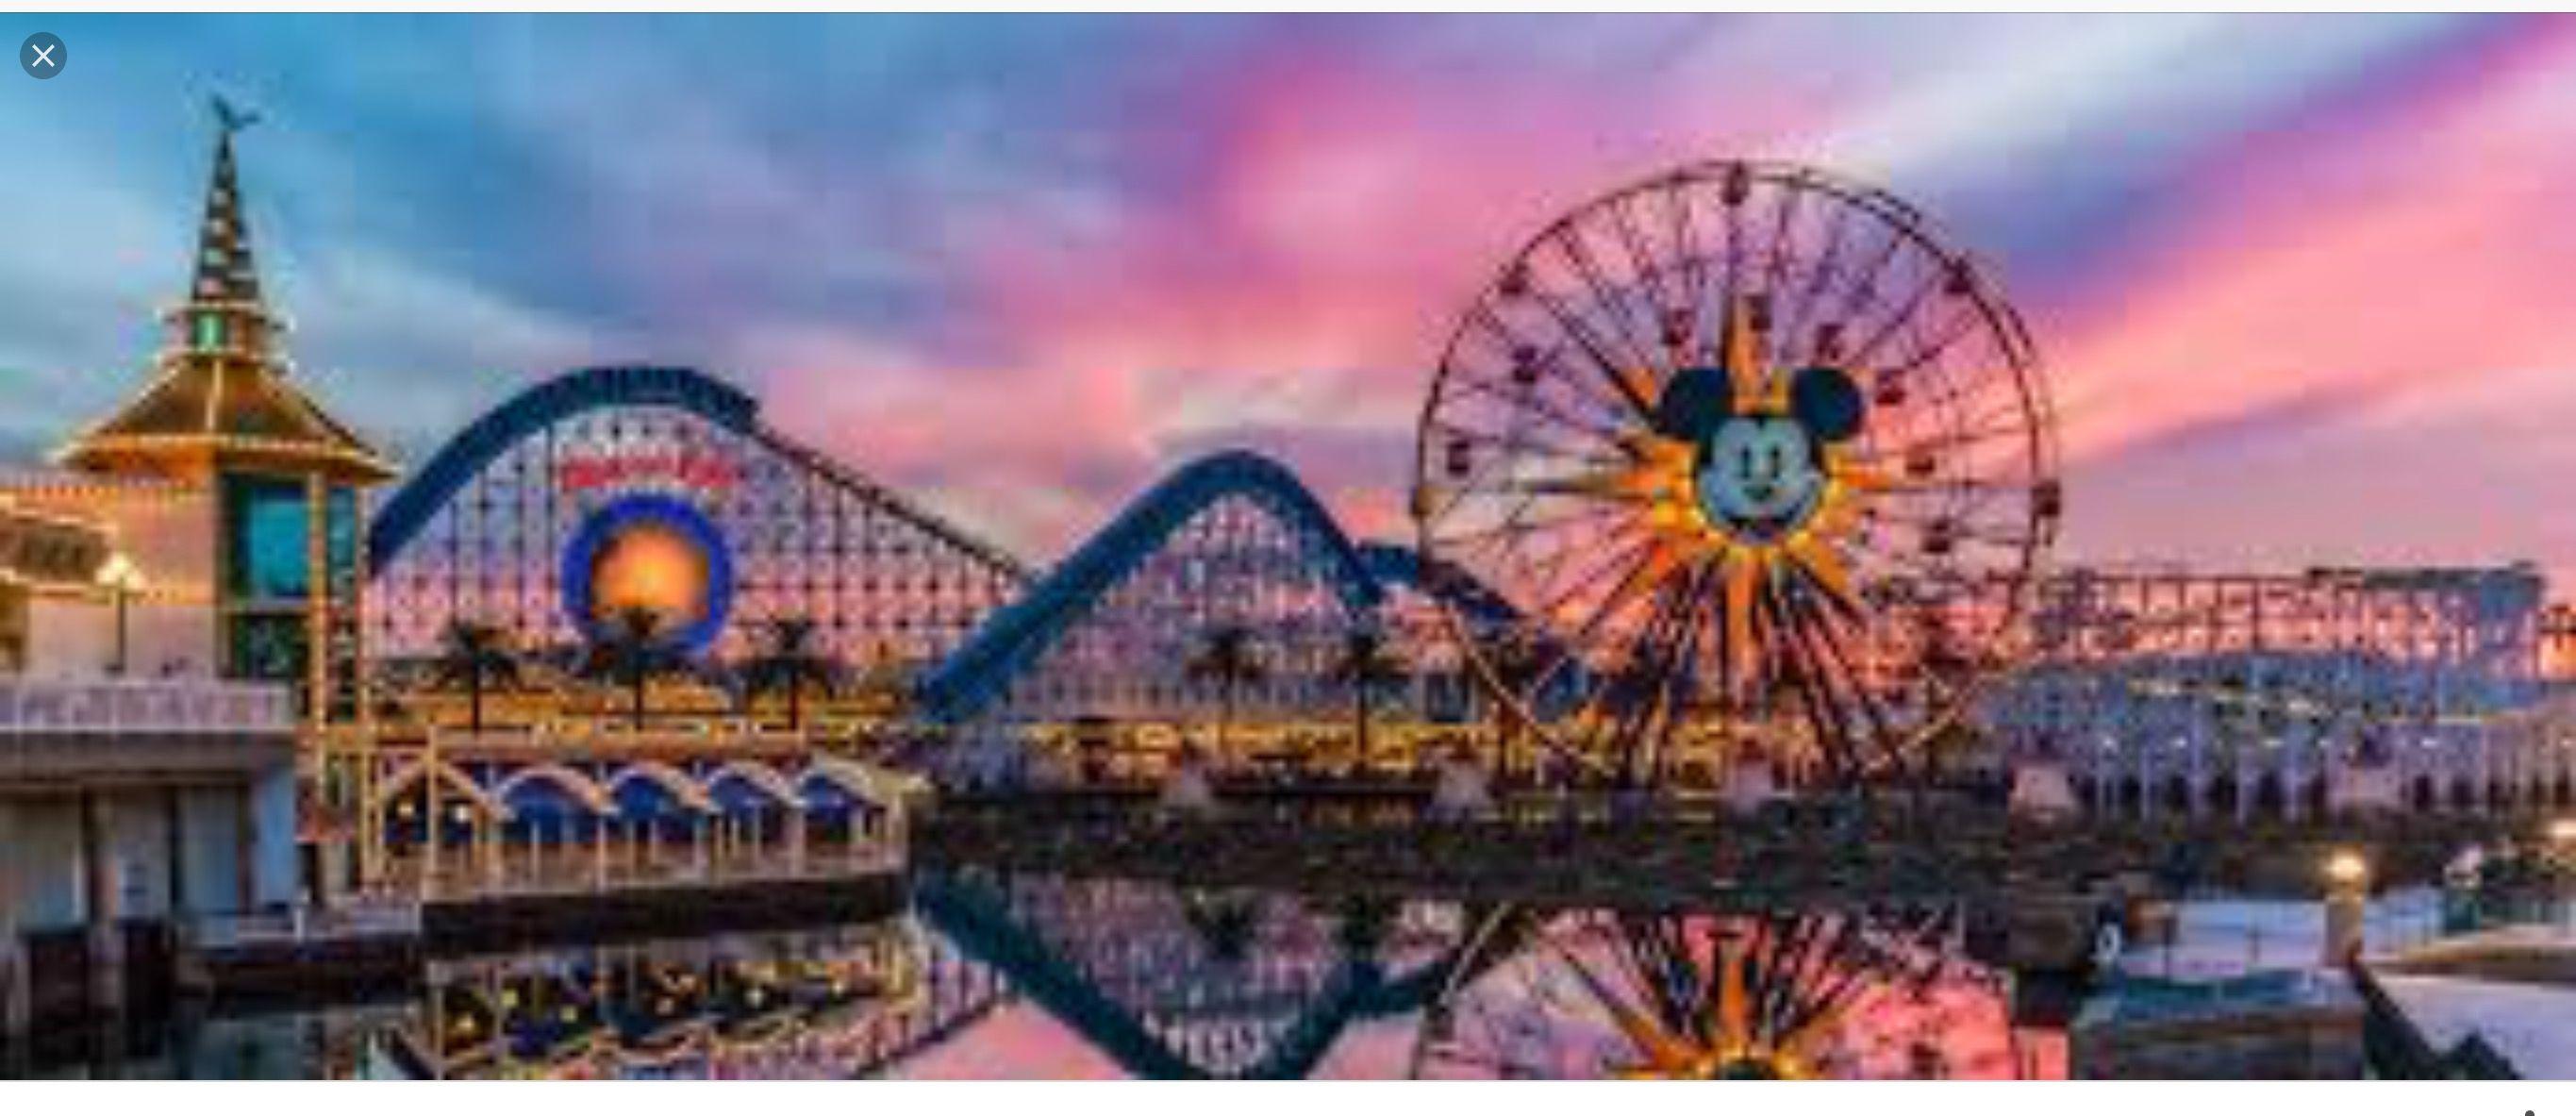 San Francisco Tours Image By Disneybookworm On Disney